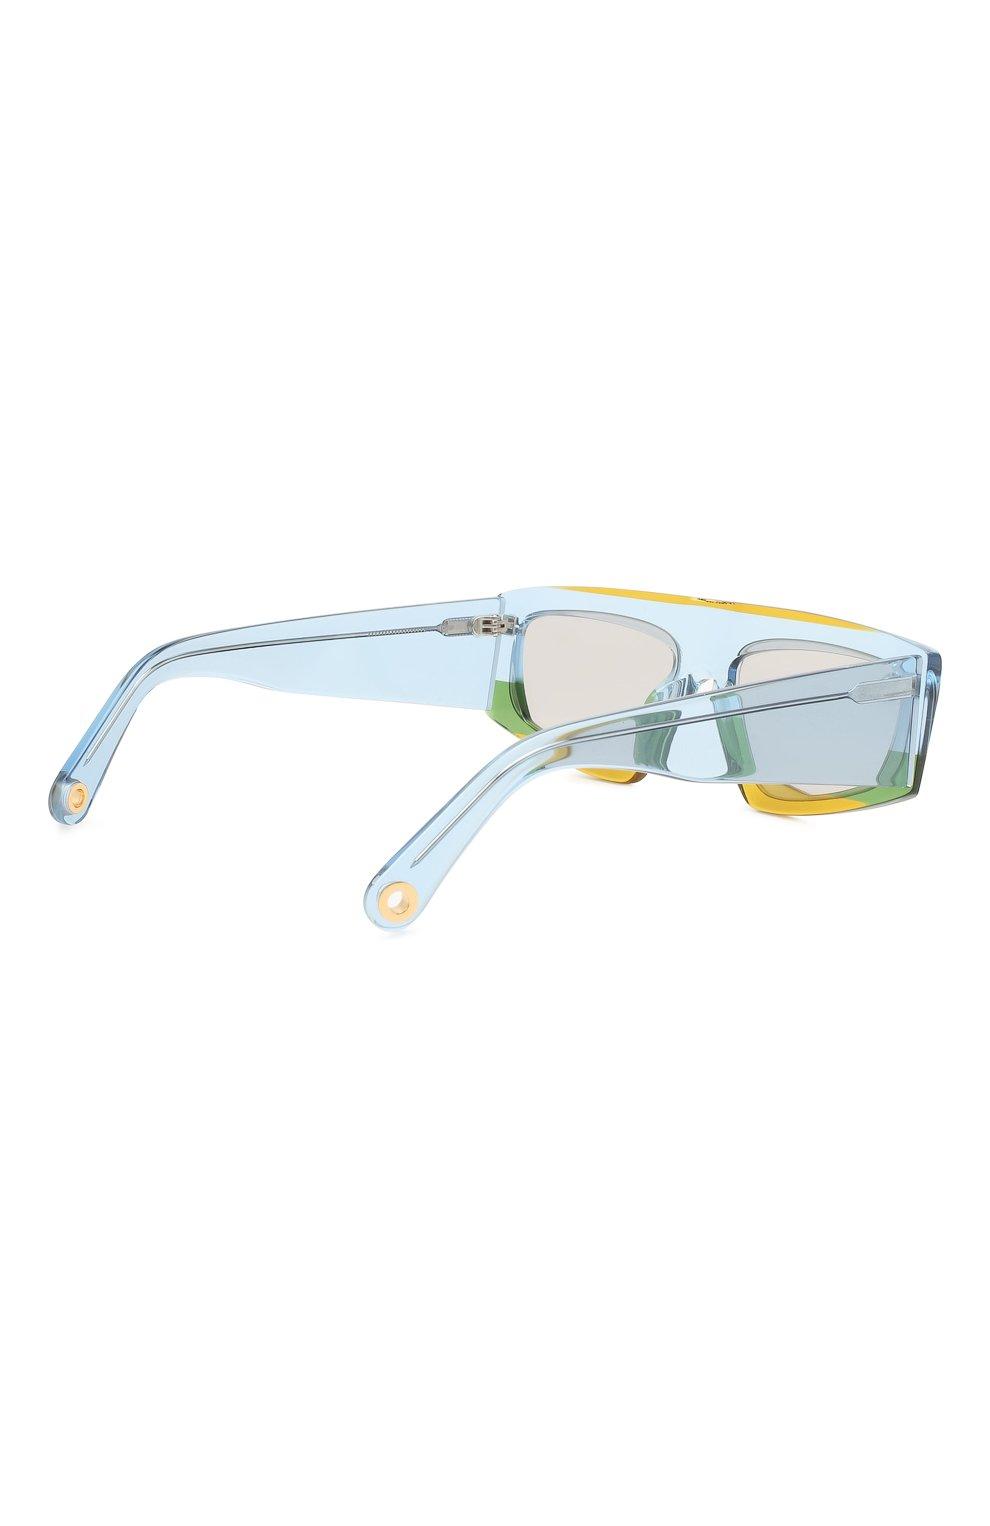 Женские солнцезащитные очки JACQUEMUS голубого цвета, арт. LES LUNETTES YAUC0 MULTI YELL0W | Фото 4